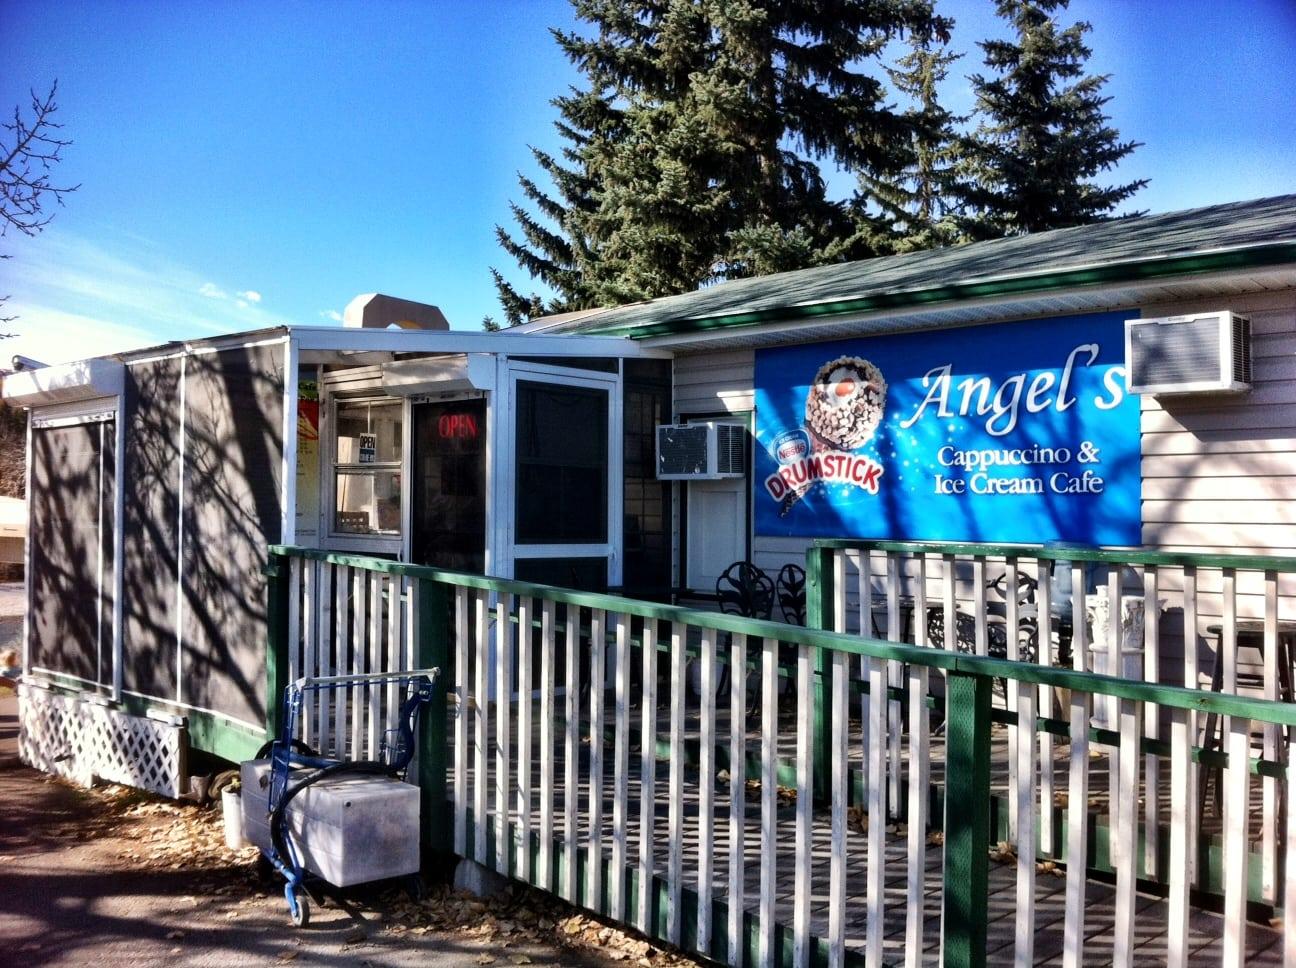 Angels Cappucino and Ice Cream Calgary Restaurant exterior